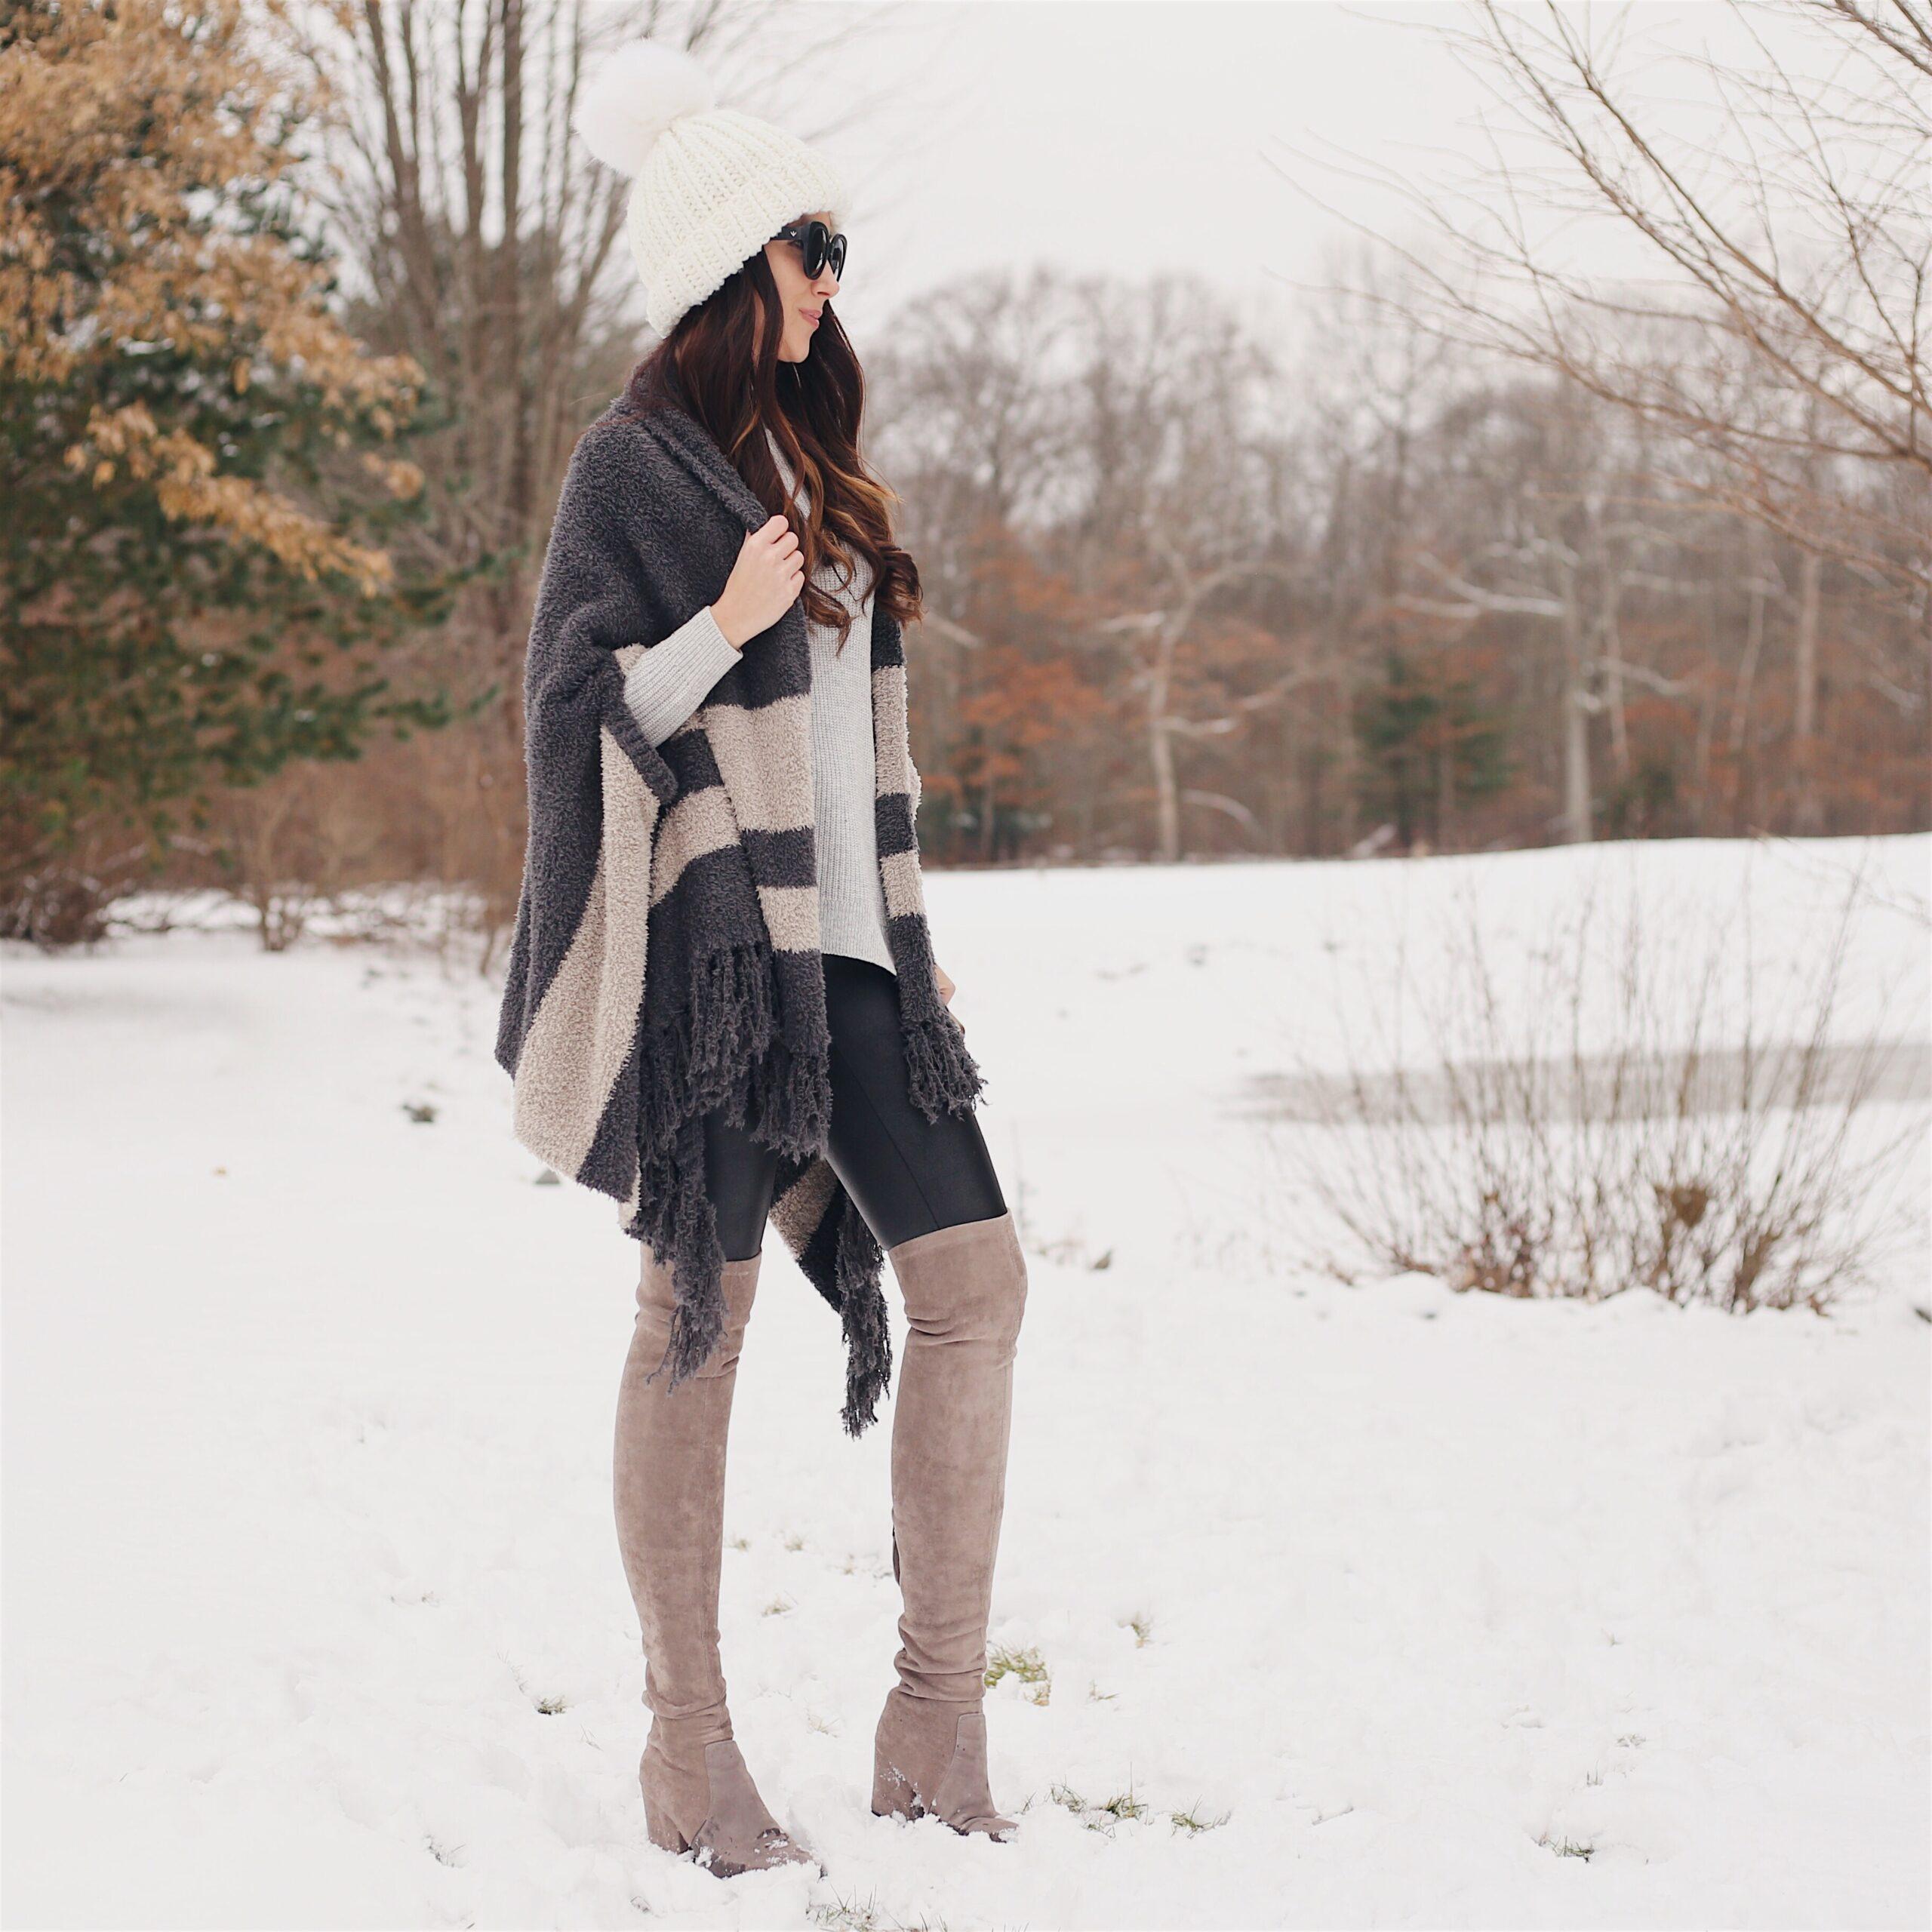 winter fashion, winter outfit, cozy winter look, cozy wrap